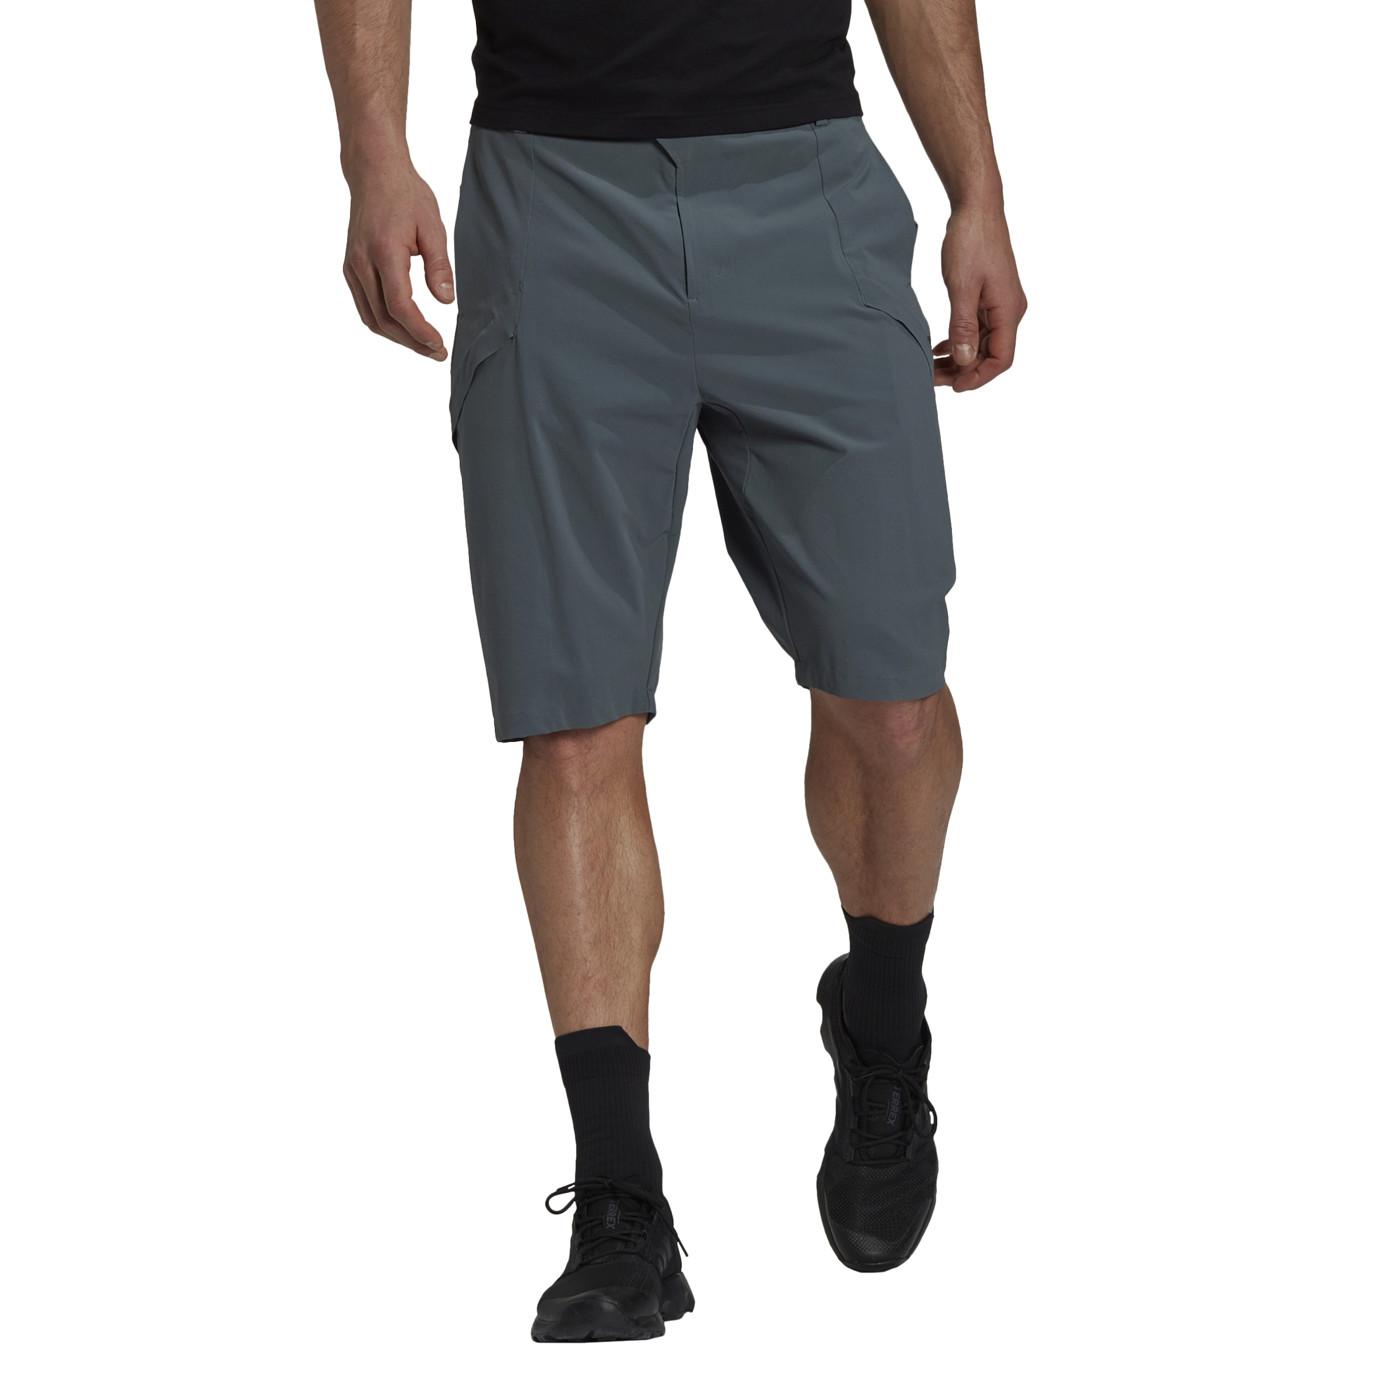 ADIDAS Hike Shorts - Herren